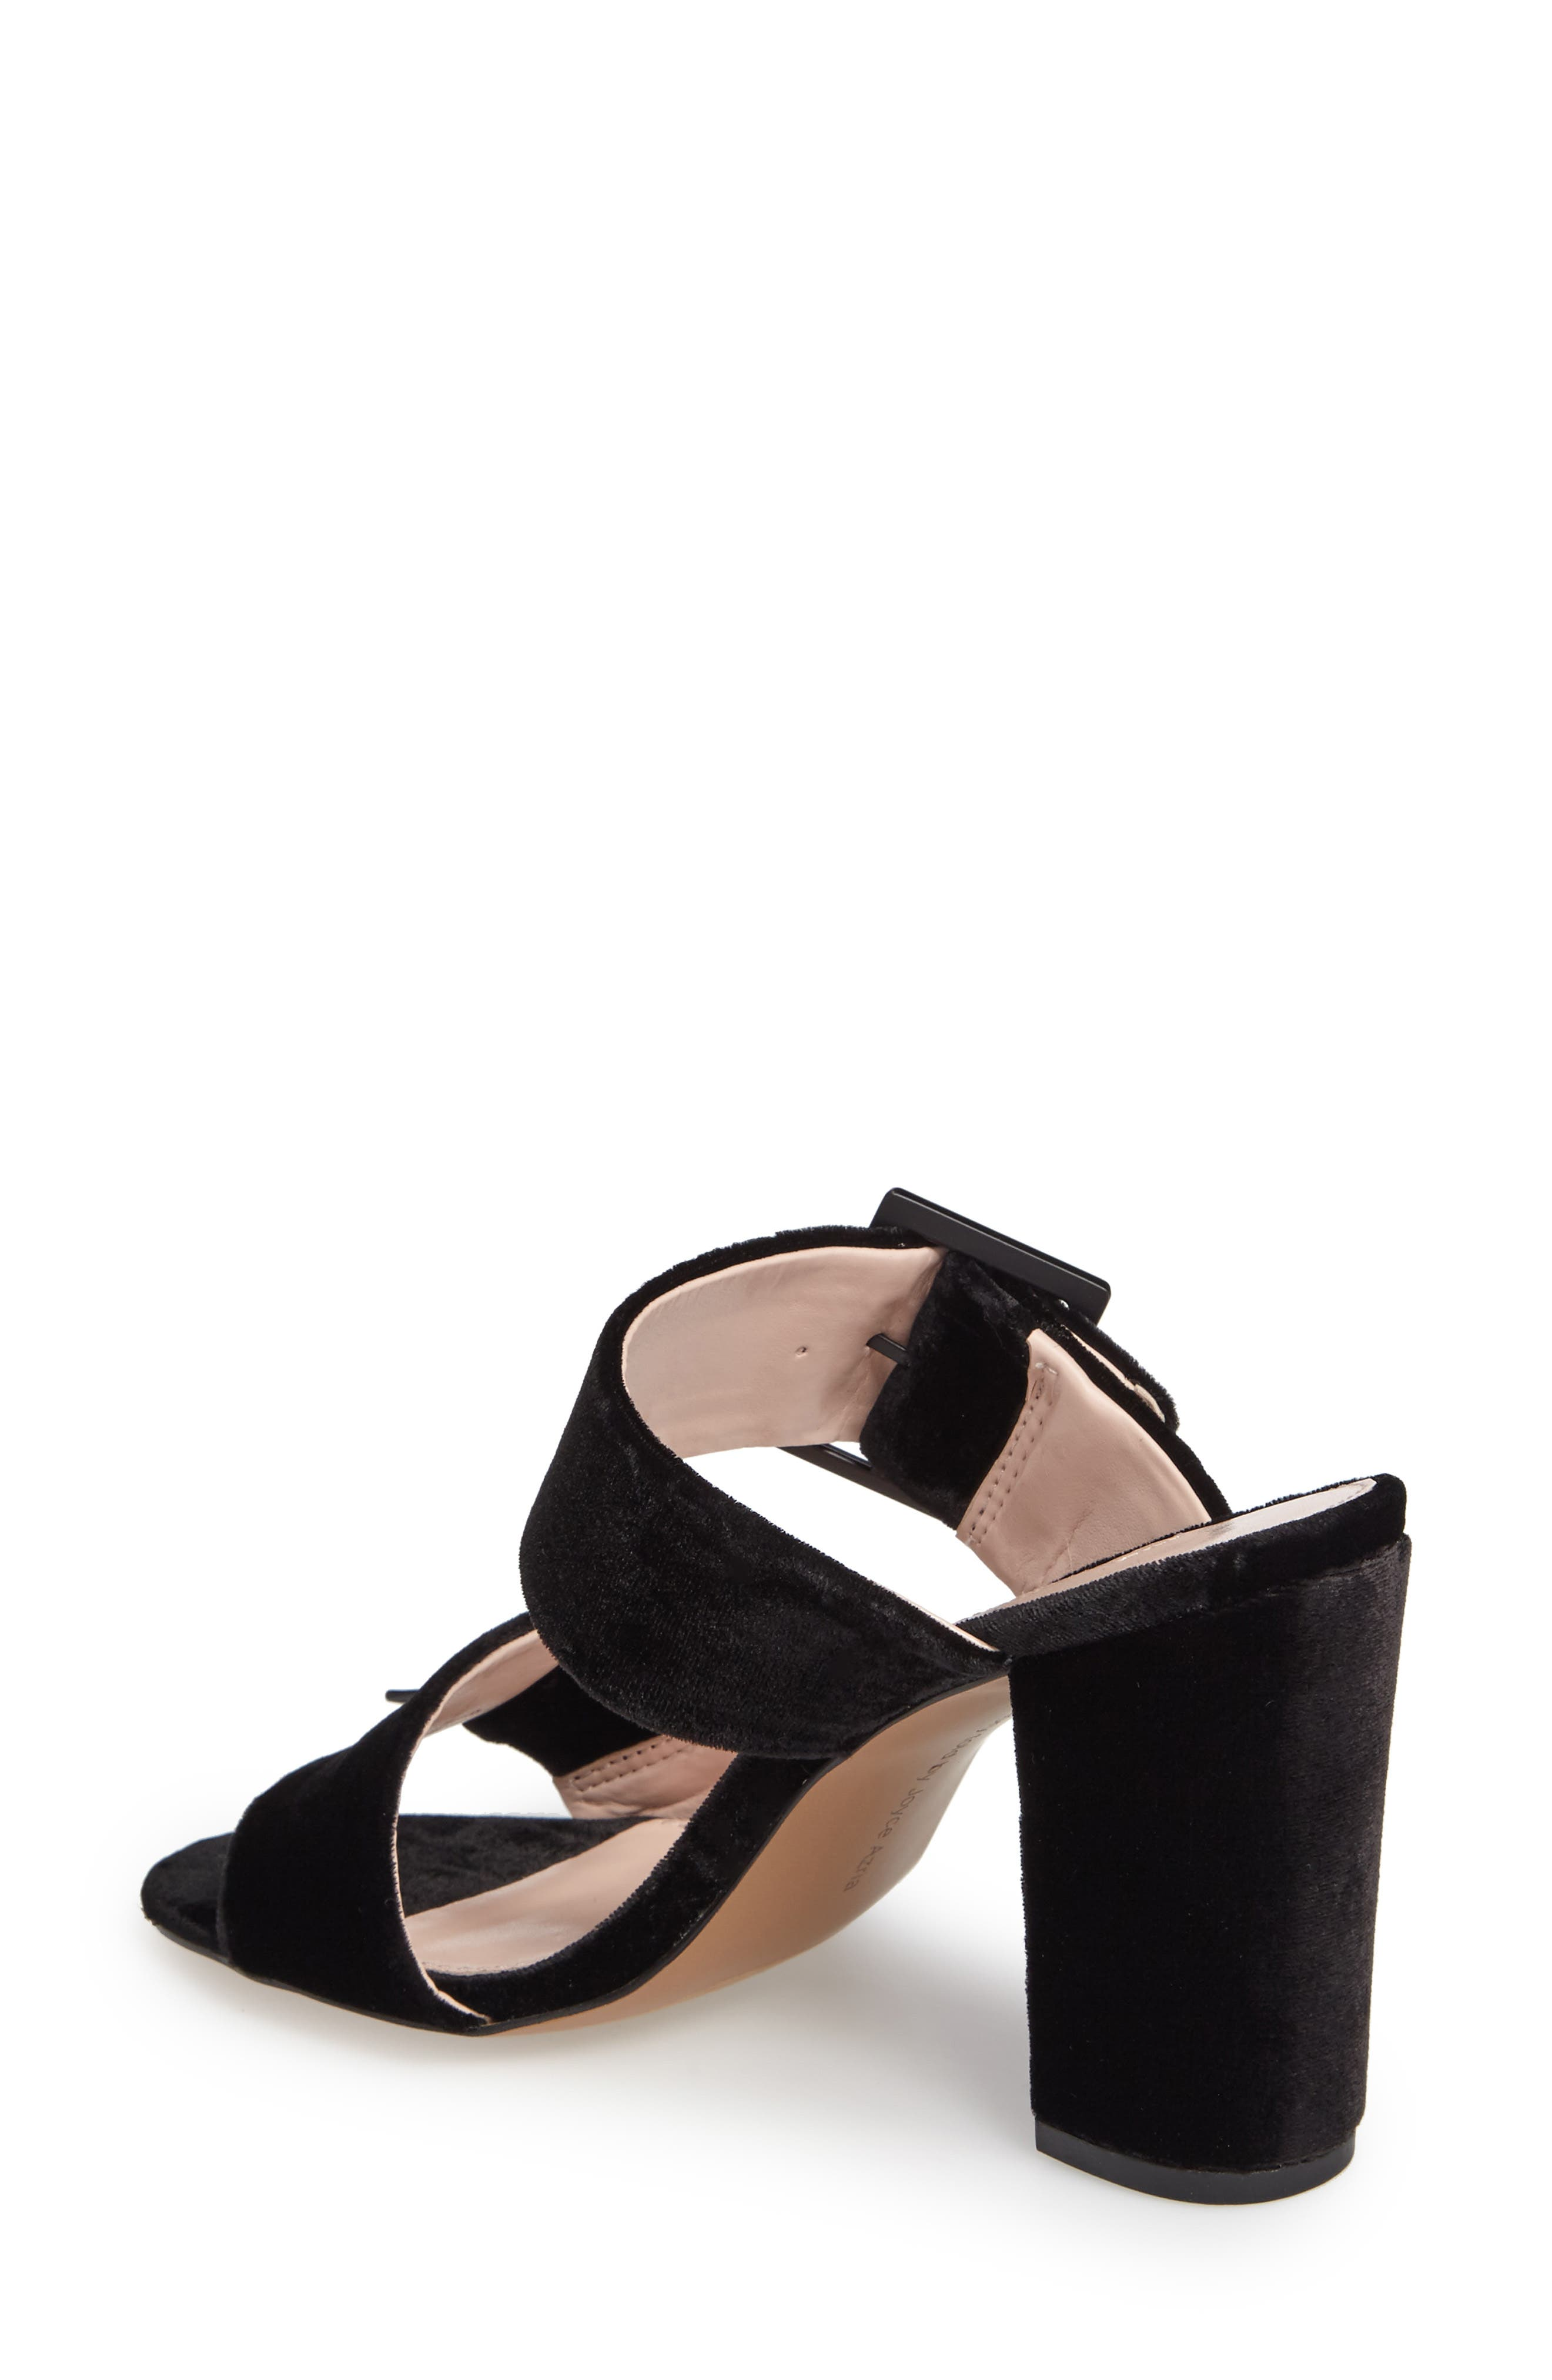 Millie Buckle Strap Sandal,                             Alternate thumbnail 2, color,                             Black Fabric